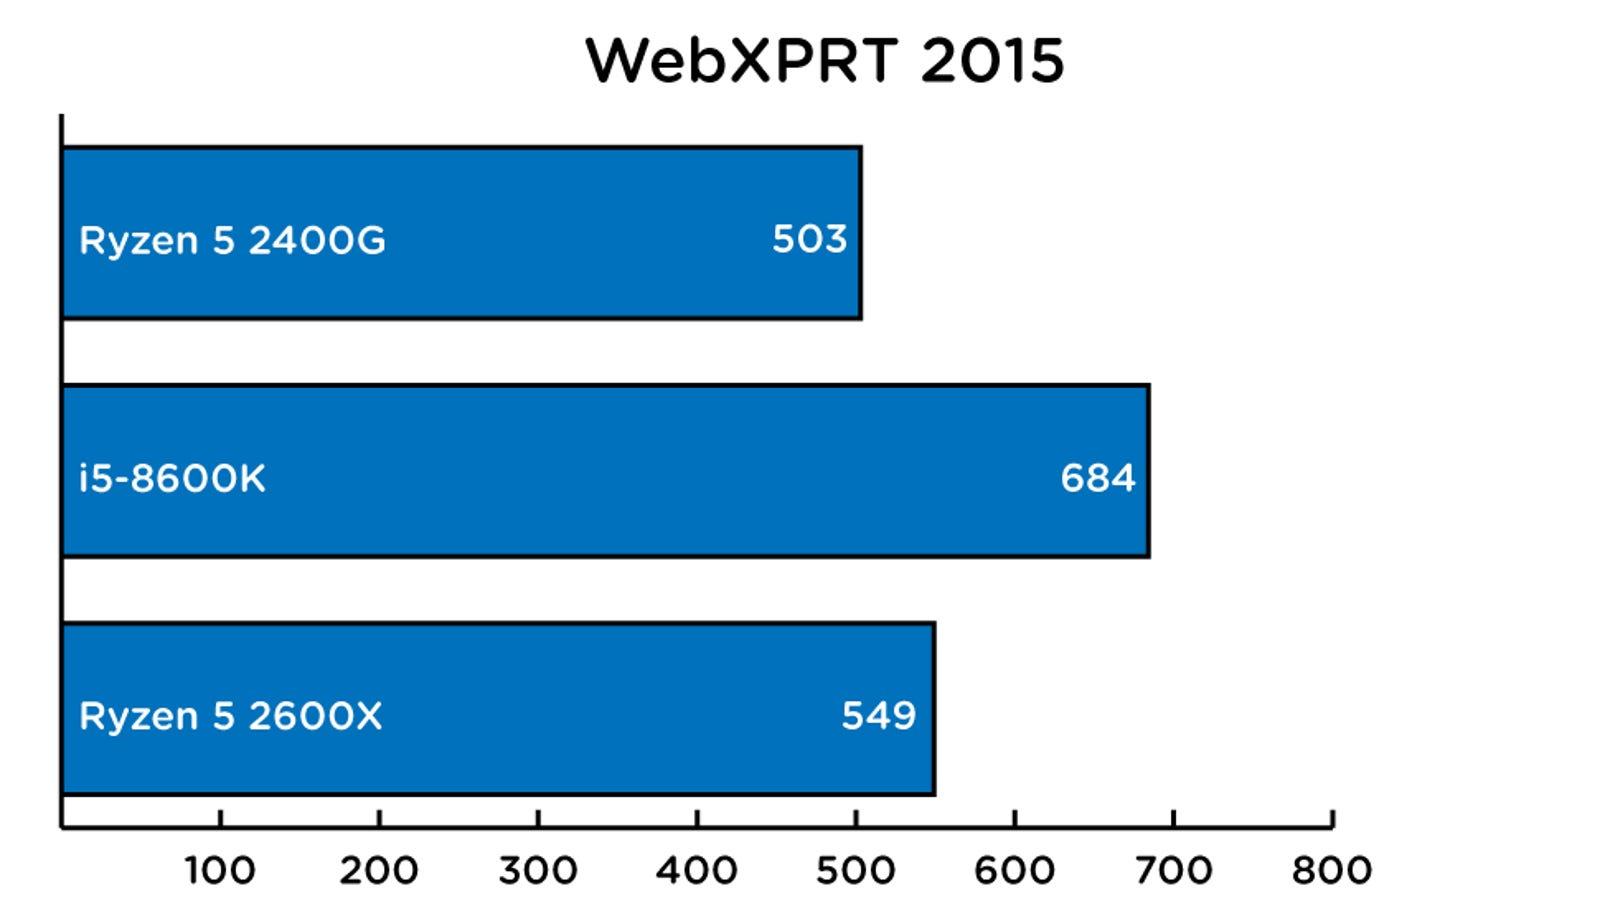 WebXPRT 2015 score. Higher is better.